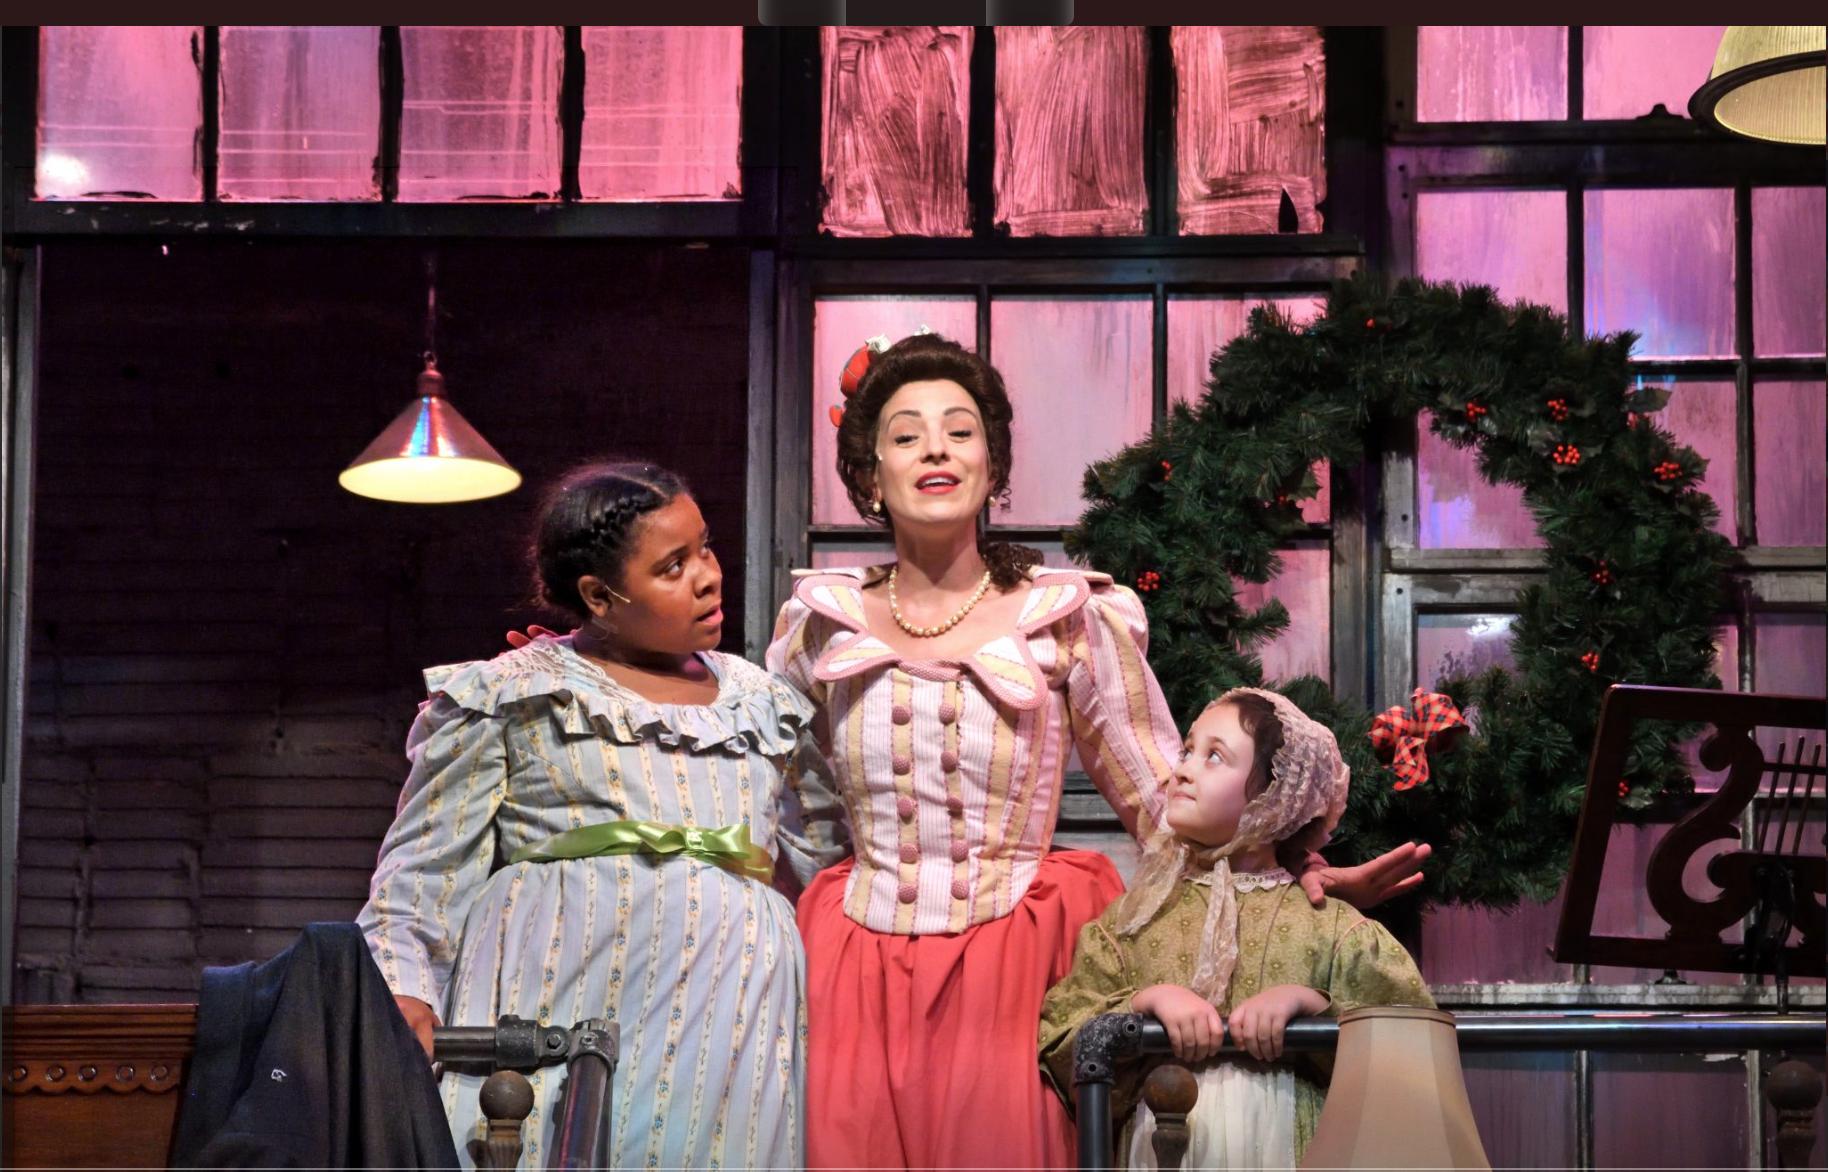 Ava Gaudet Christmas Carol Trinity 2